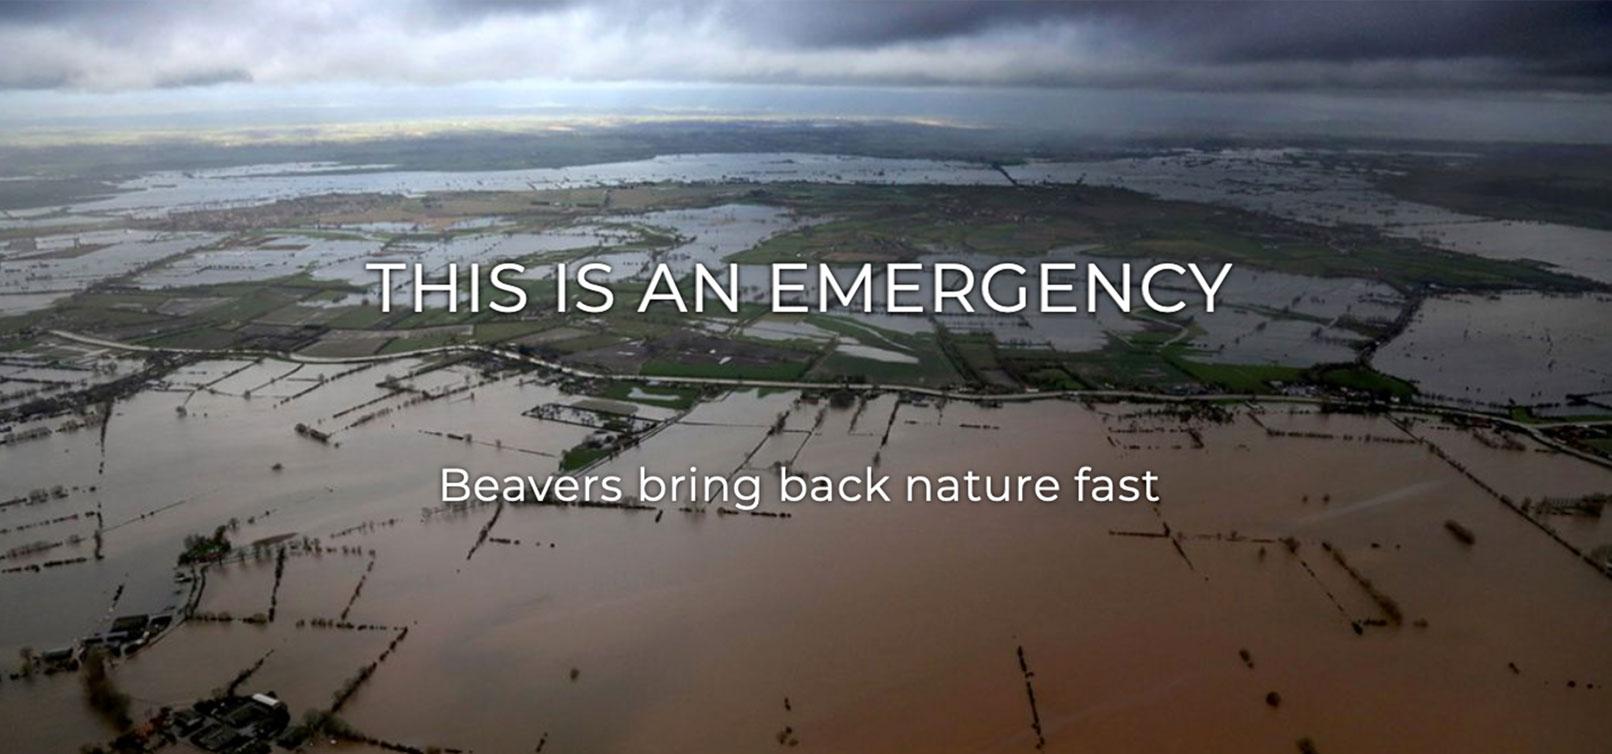 Beavers bring back nature fast